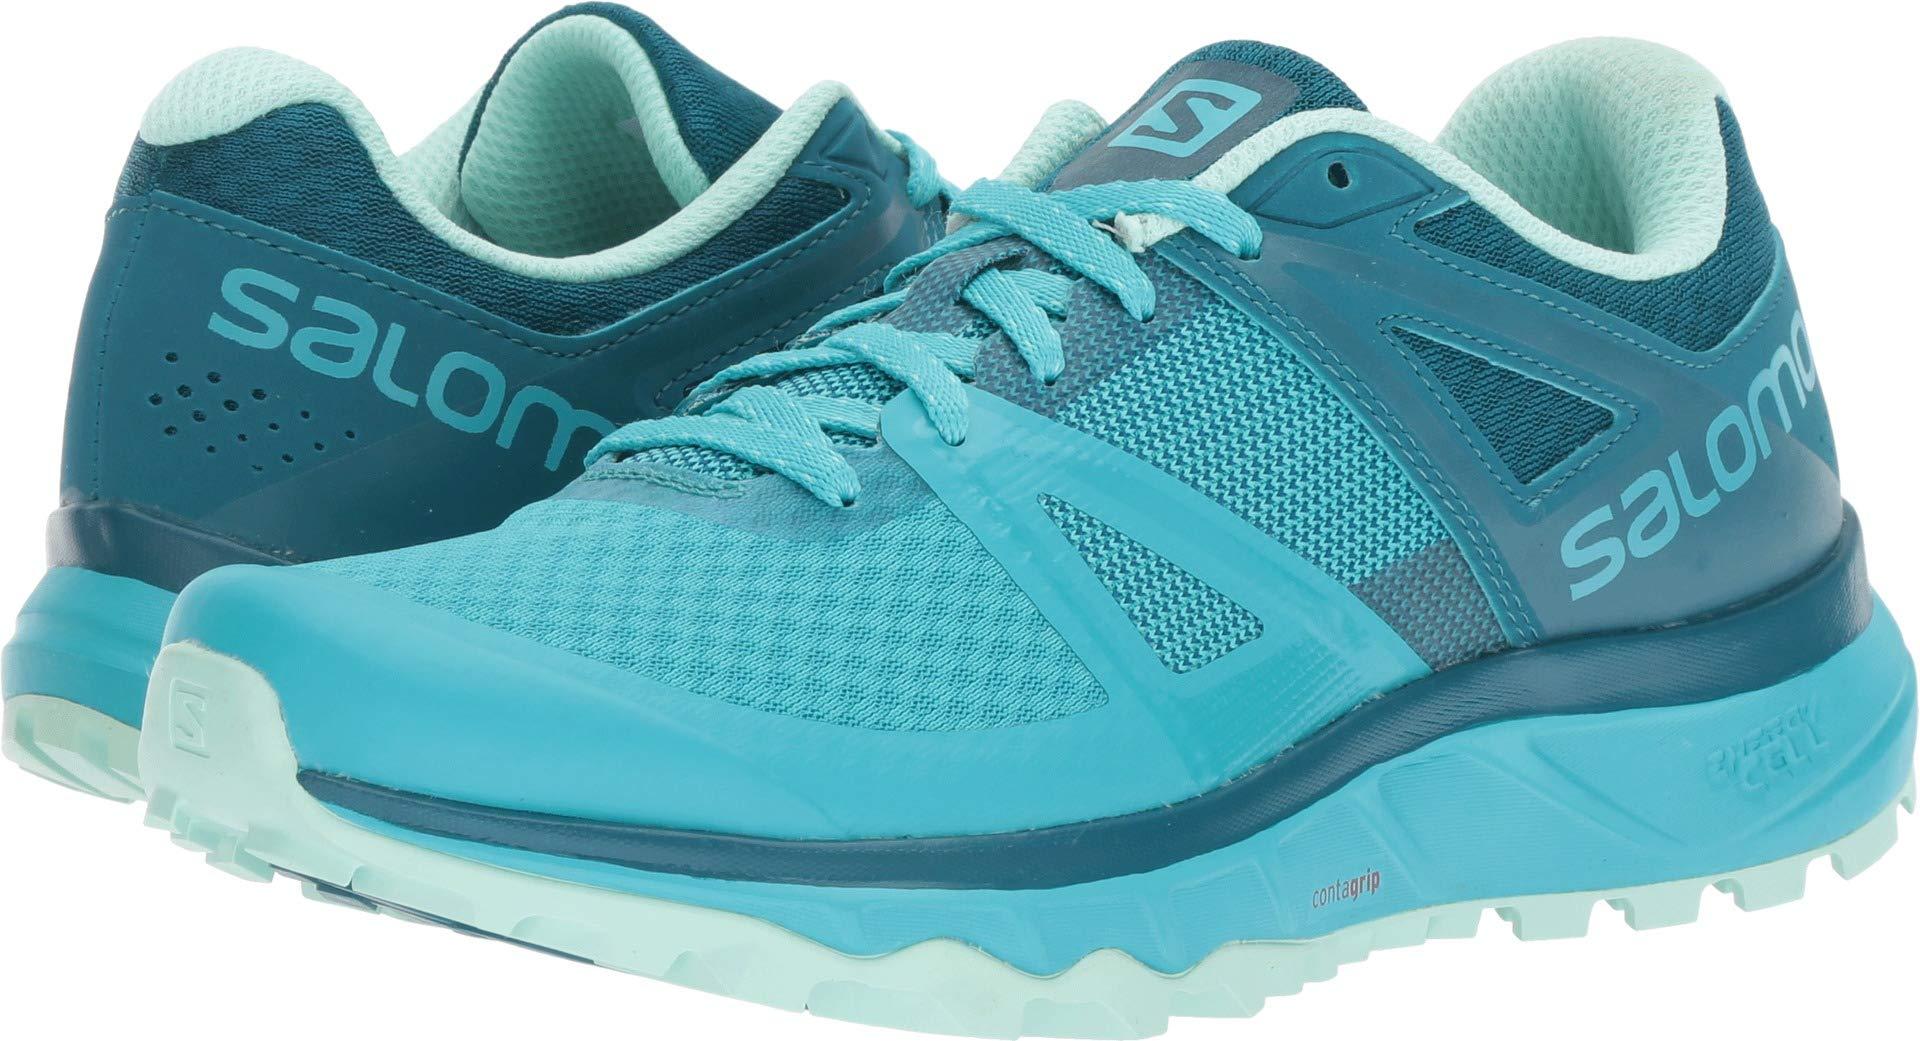 Salomon Women's TRAILSTER W Trail Running Shoe, Bluebird/deep Lagoon/Beach Glass, 6.5 B US